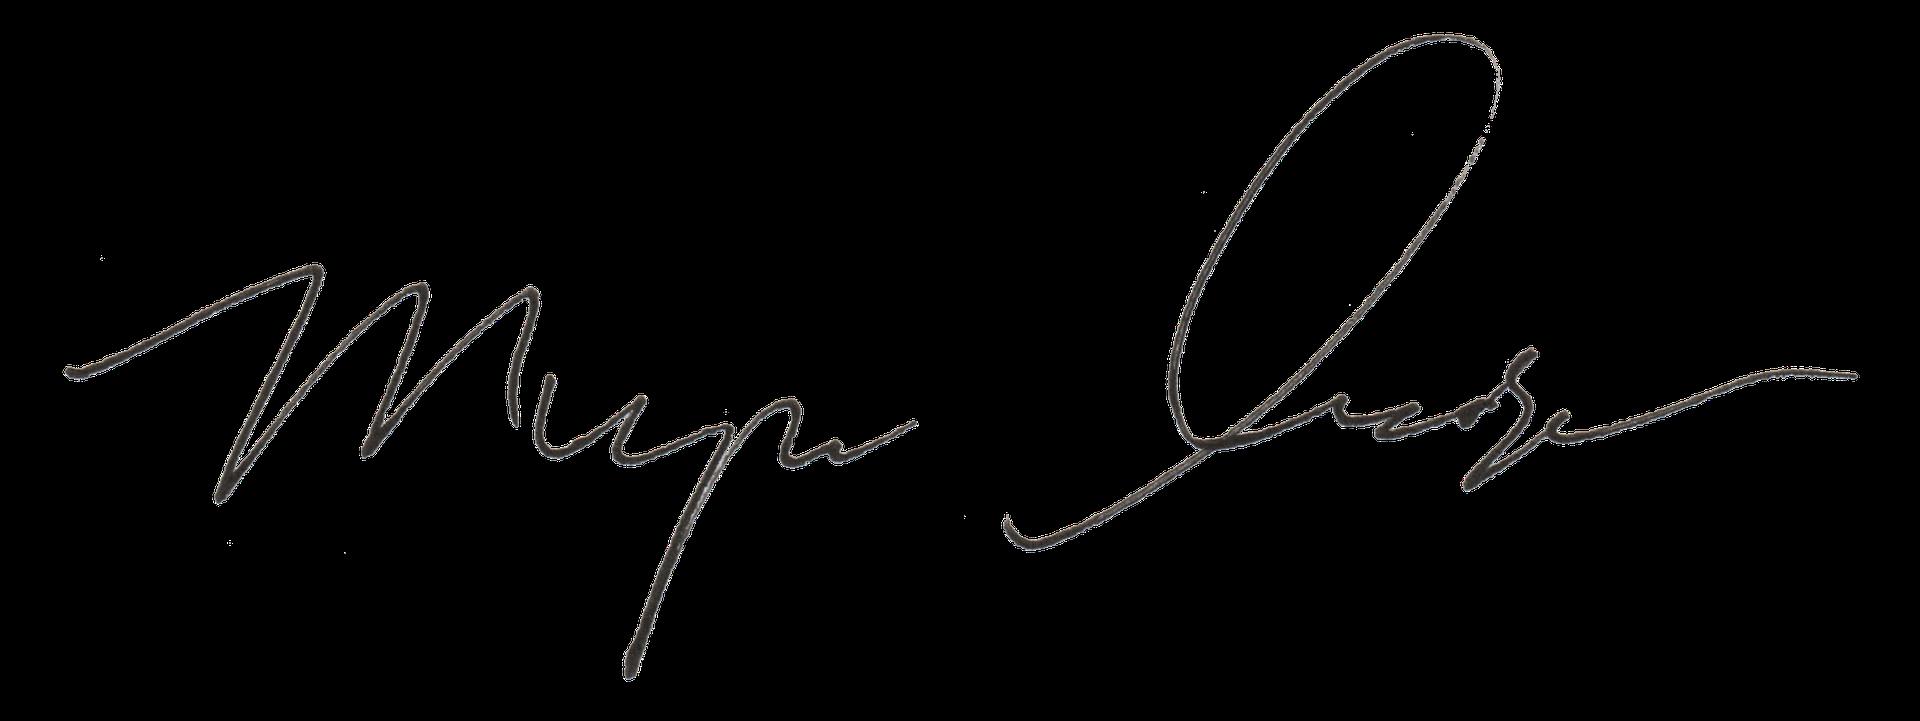 Myron Anderson signature